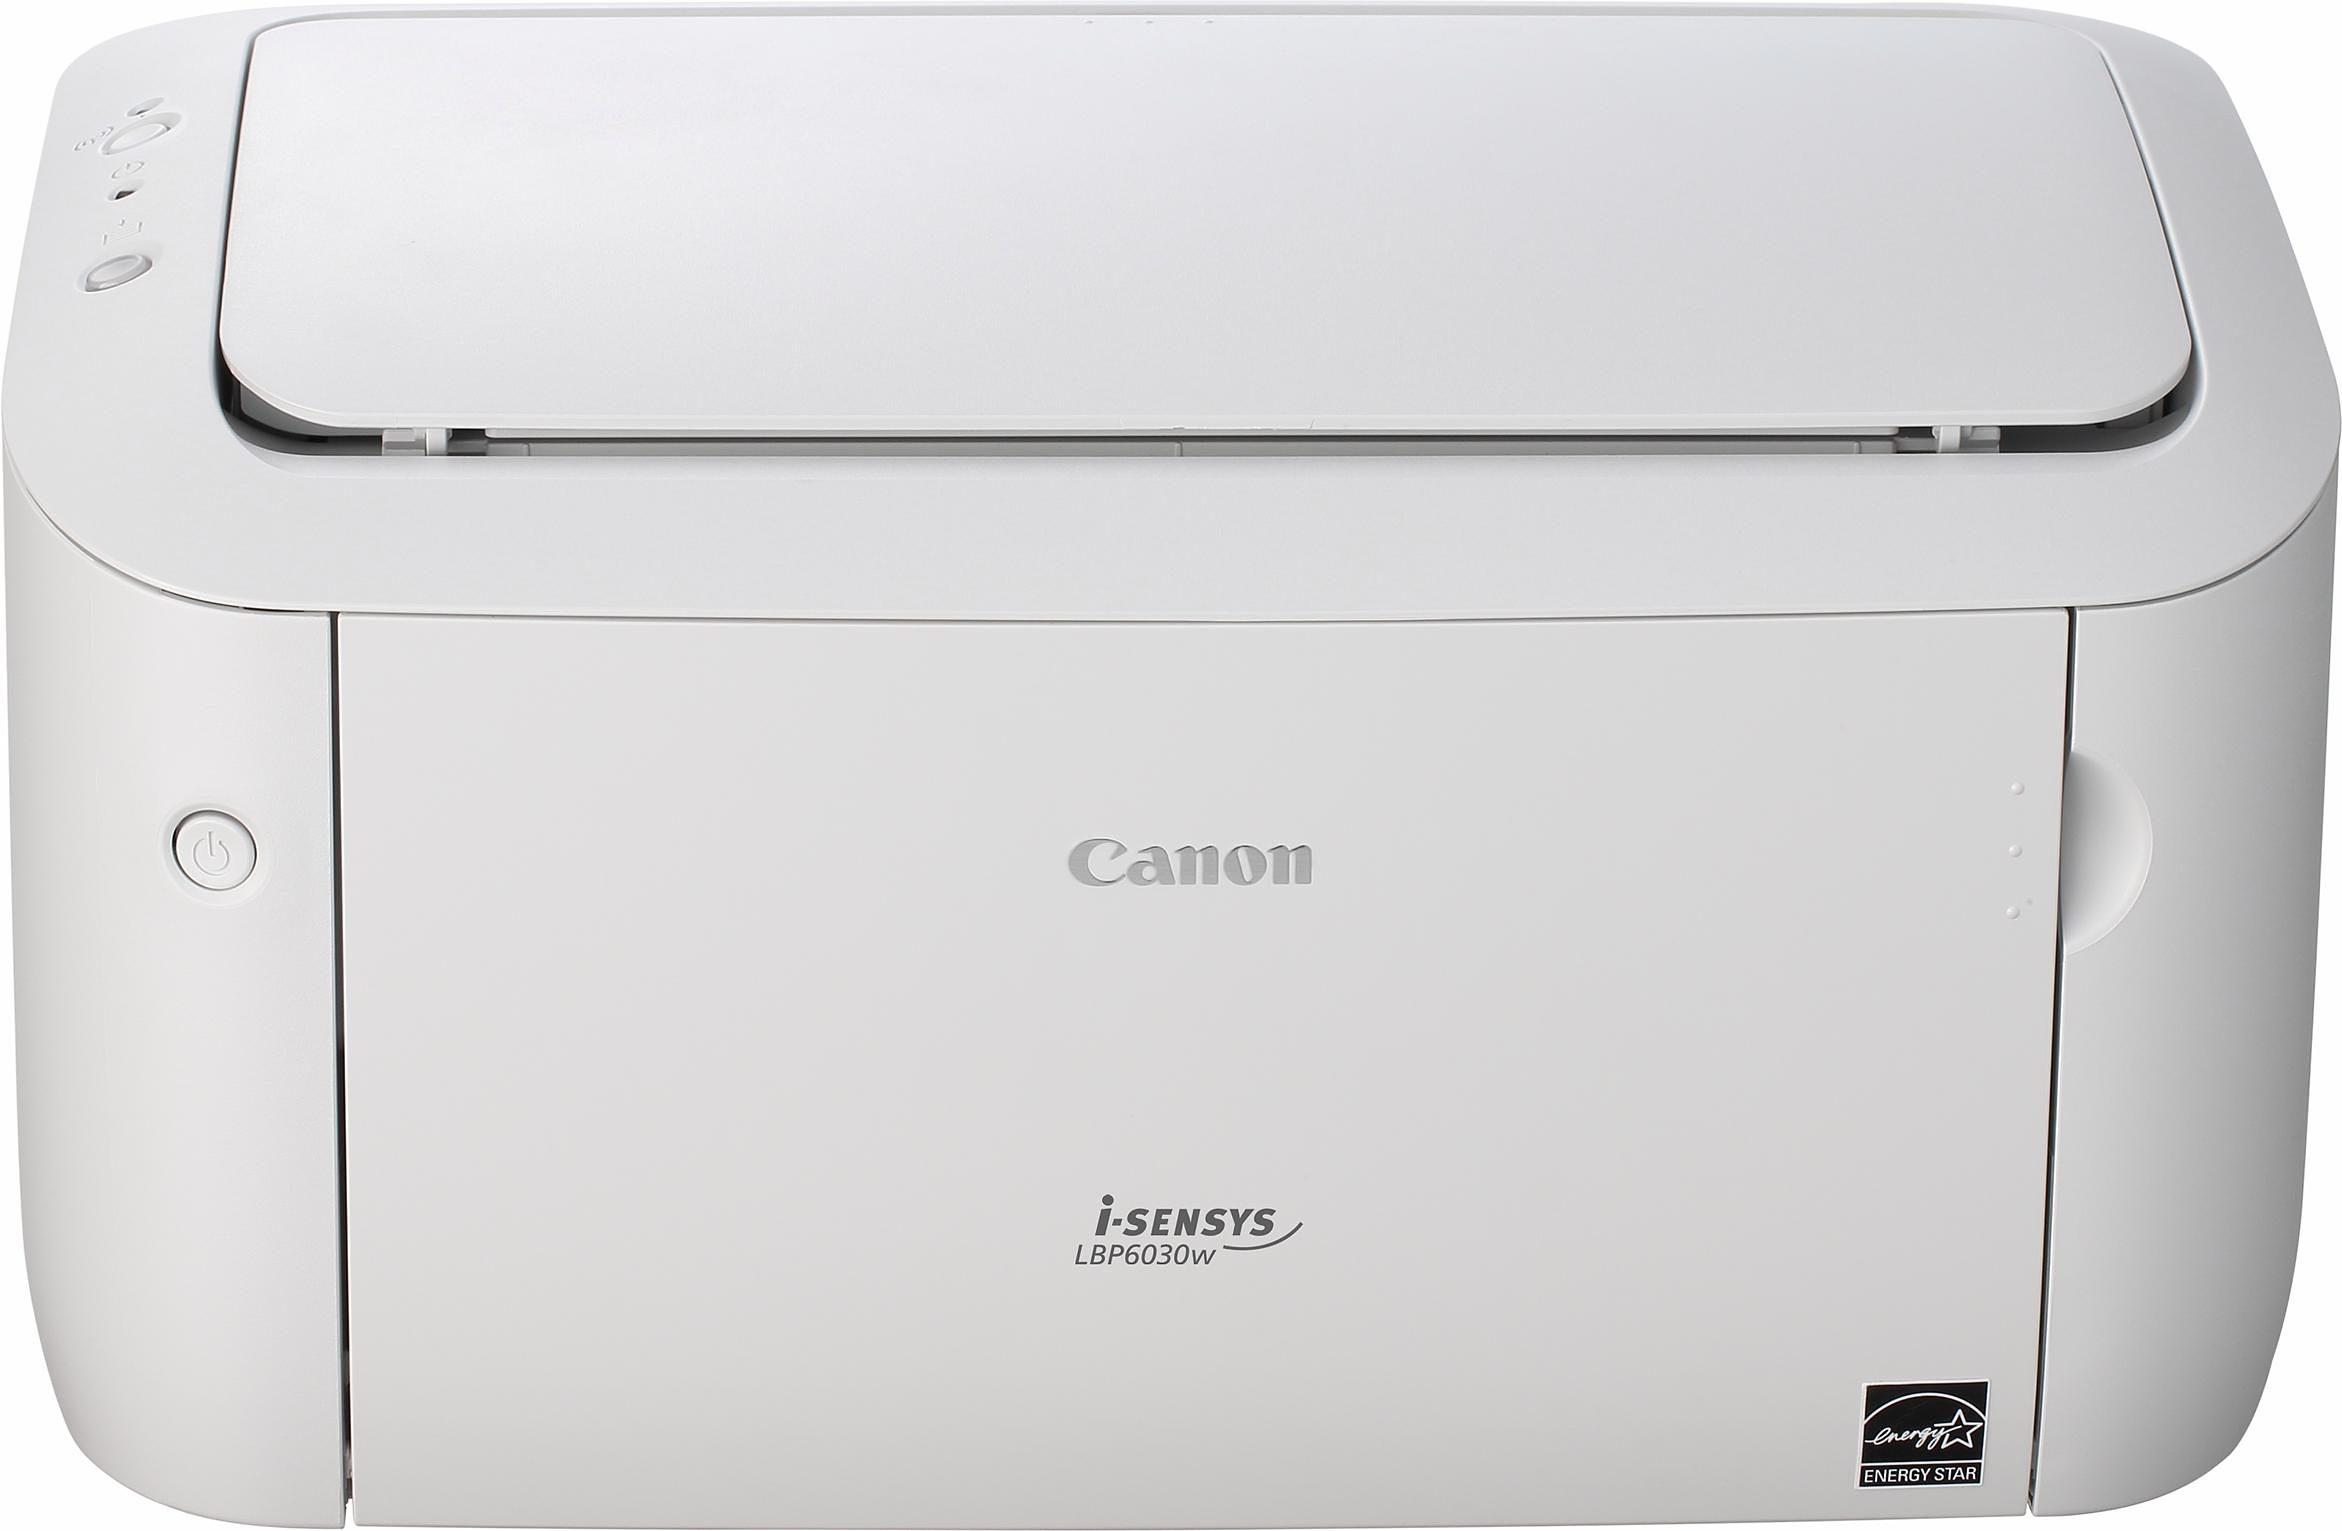 Canon i-SENSYS LBP6030w Drucker